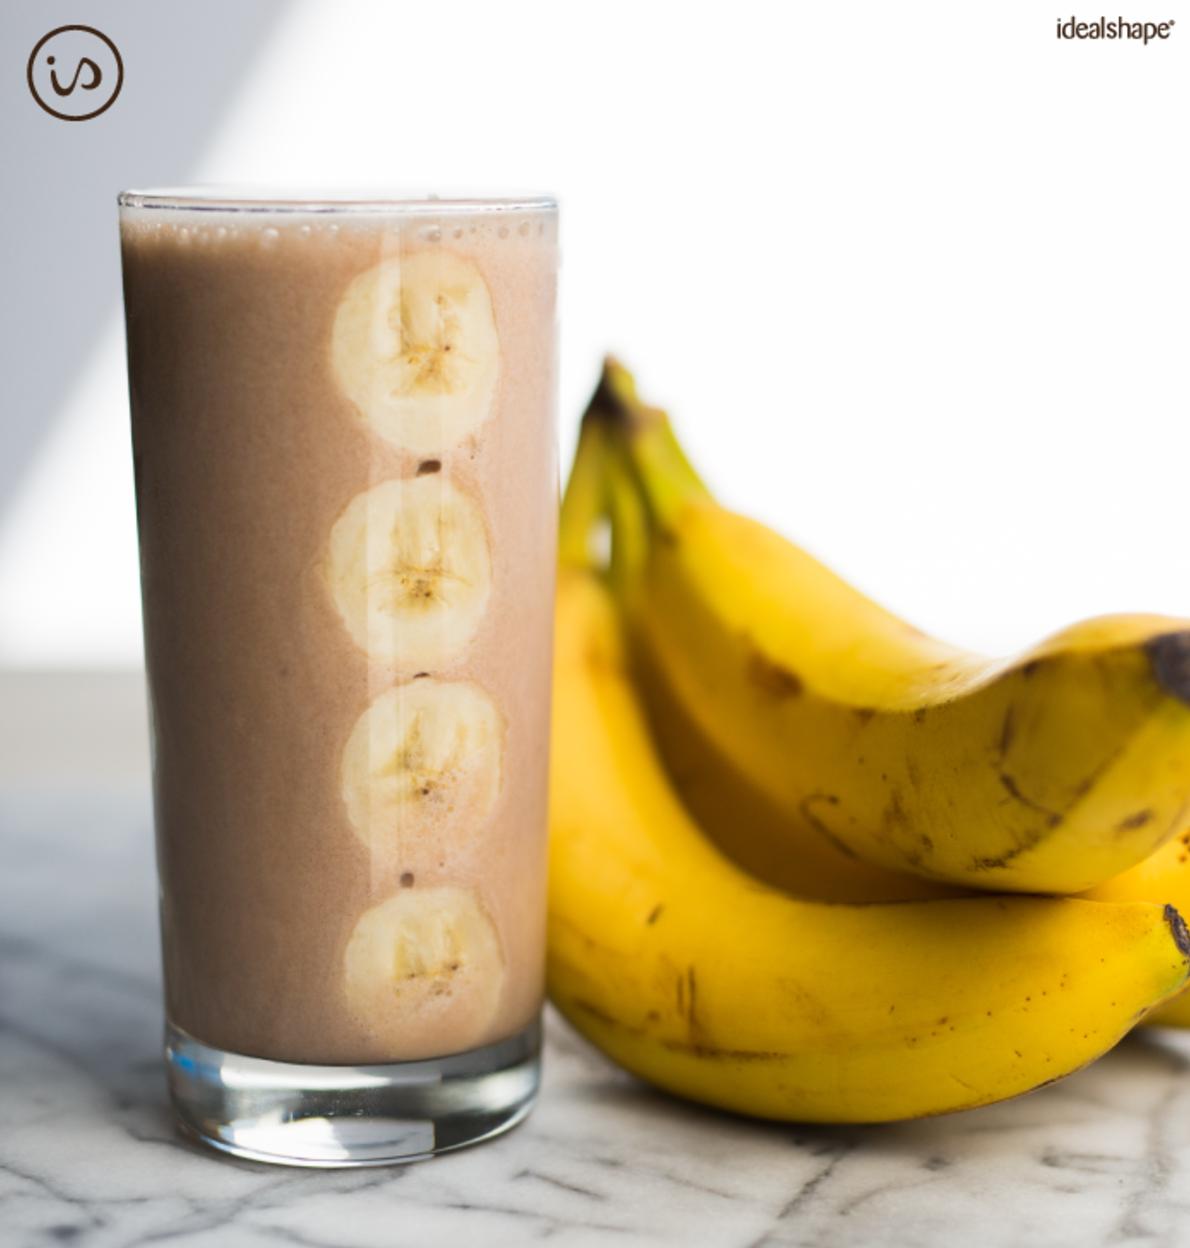 chocolate cream banana smoothie